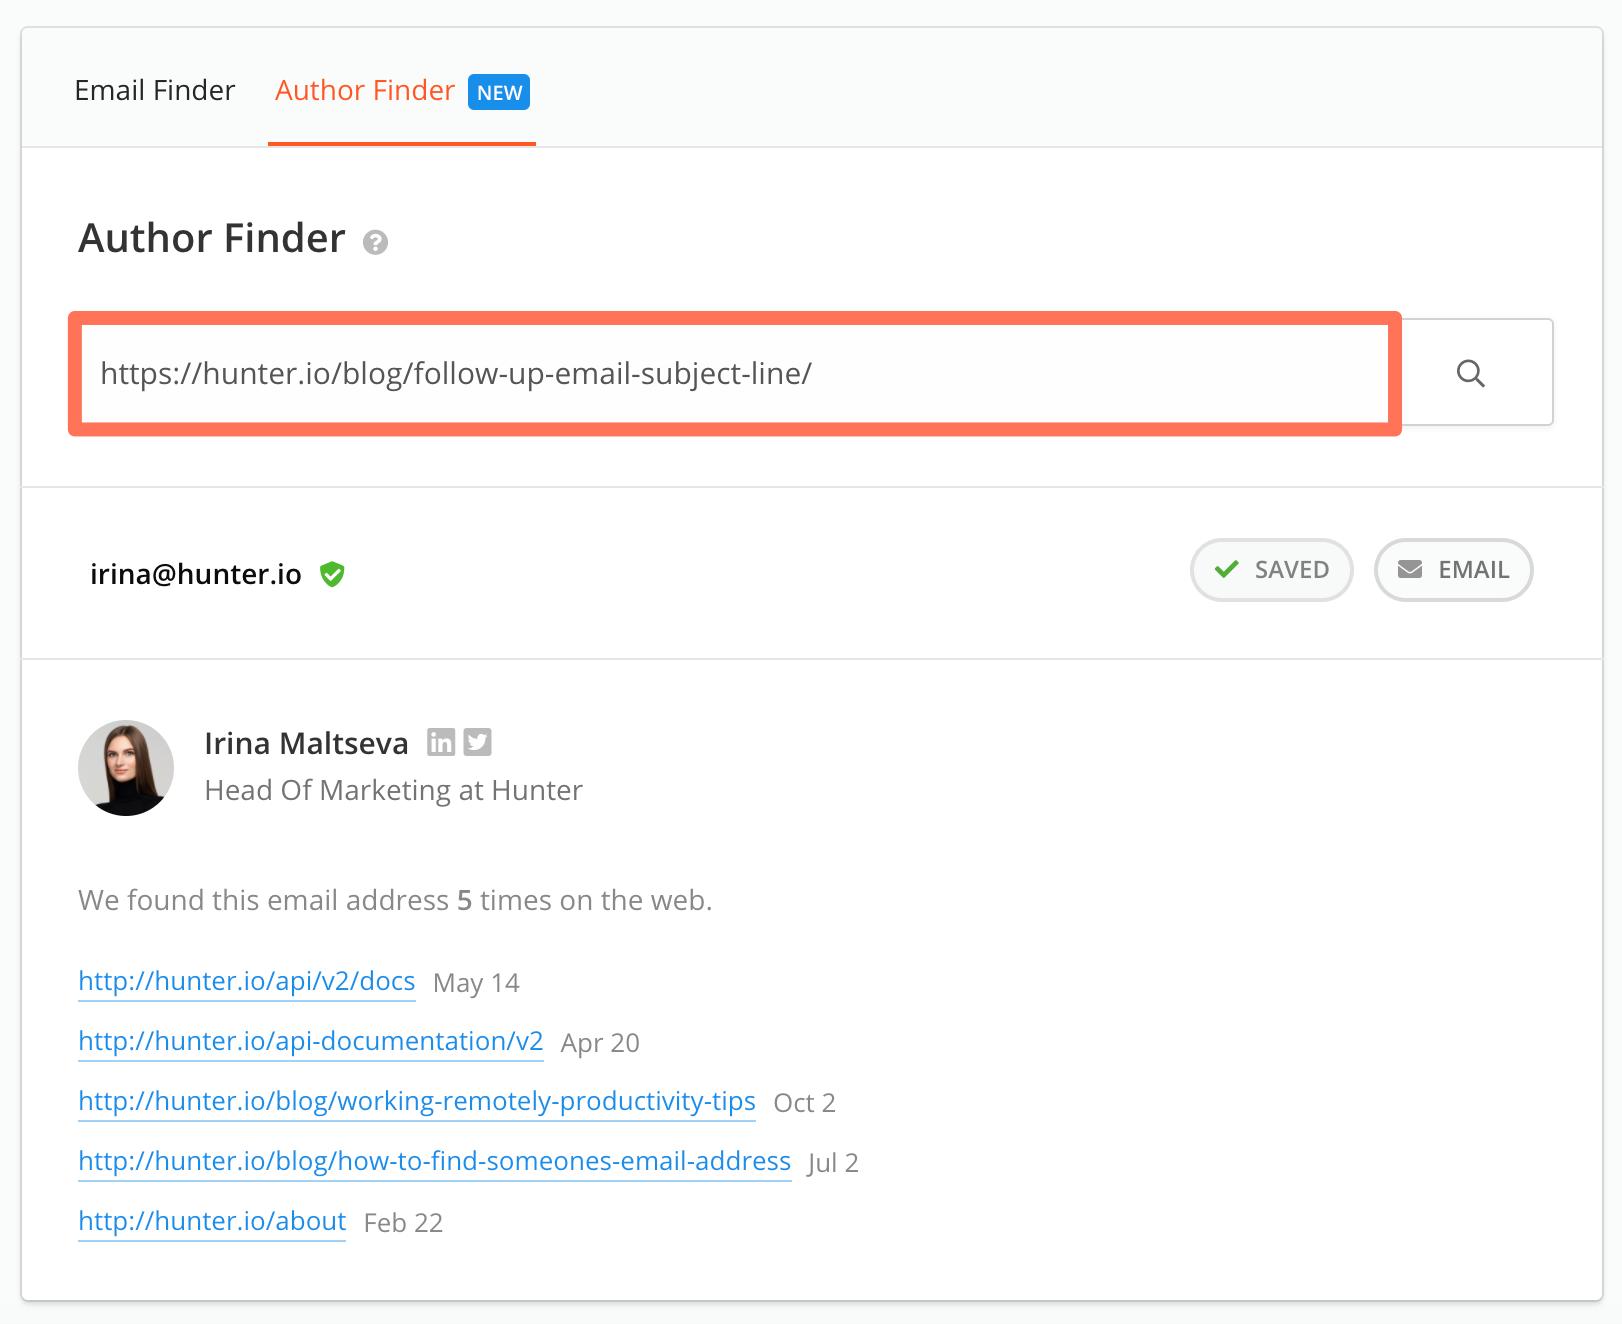 Author Finder result